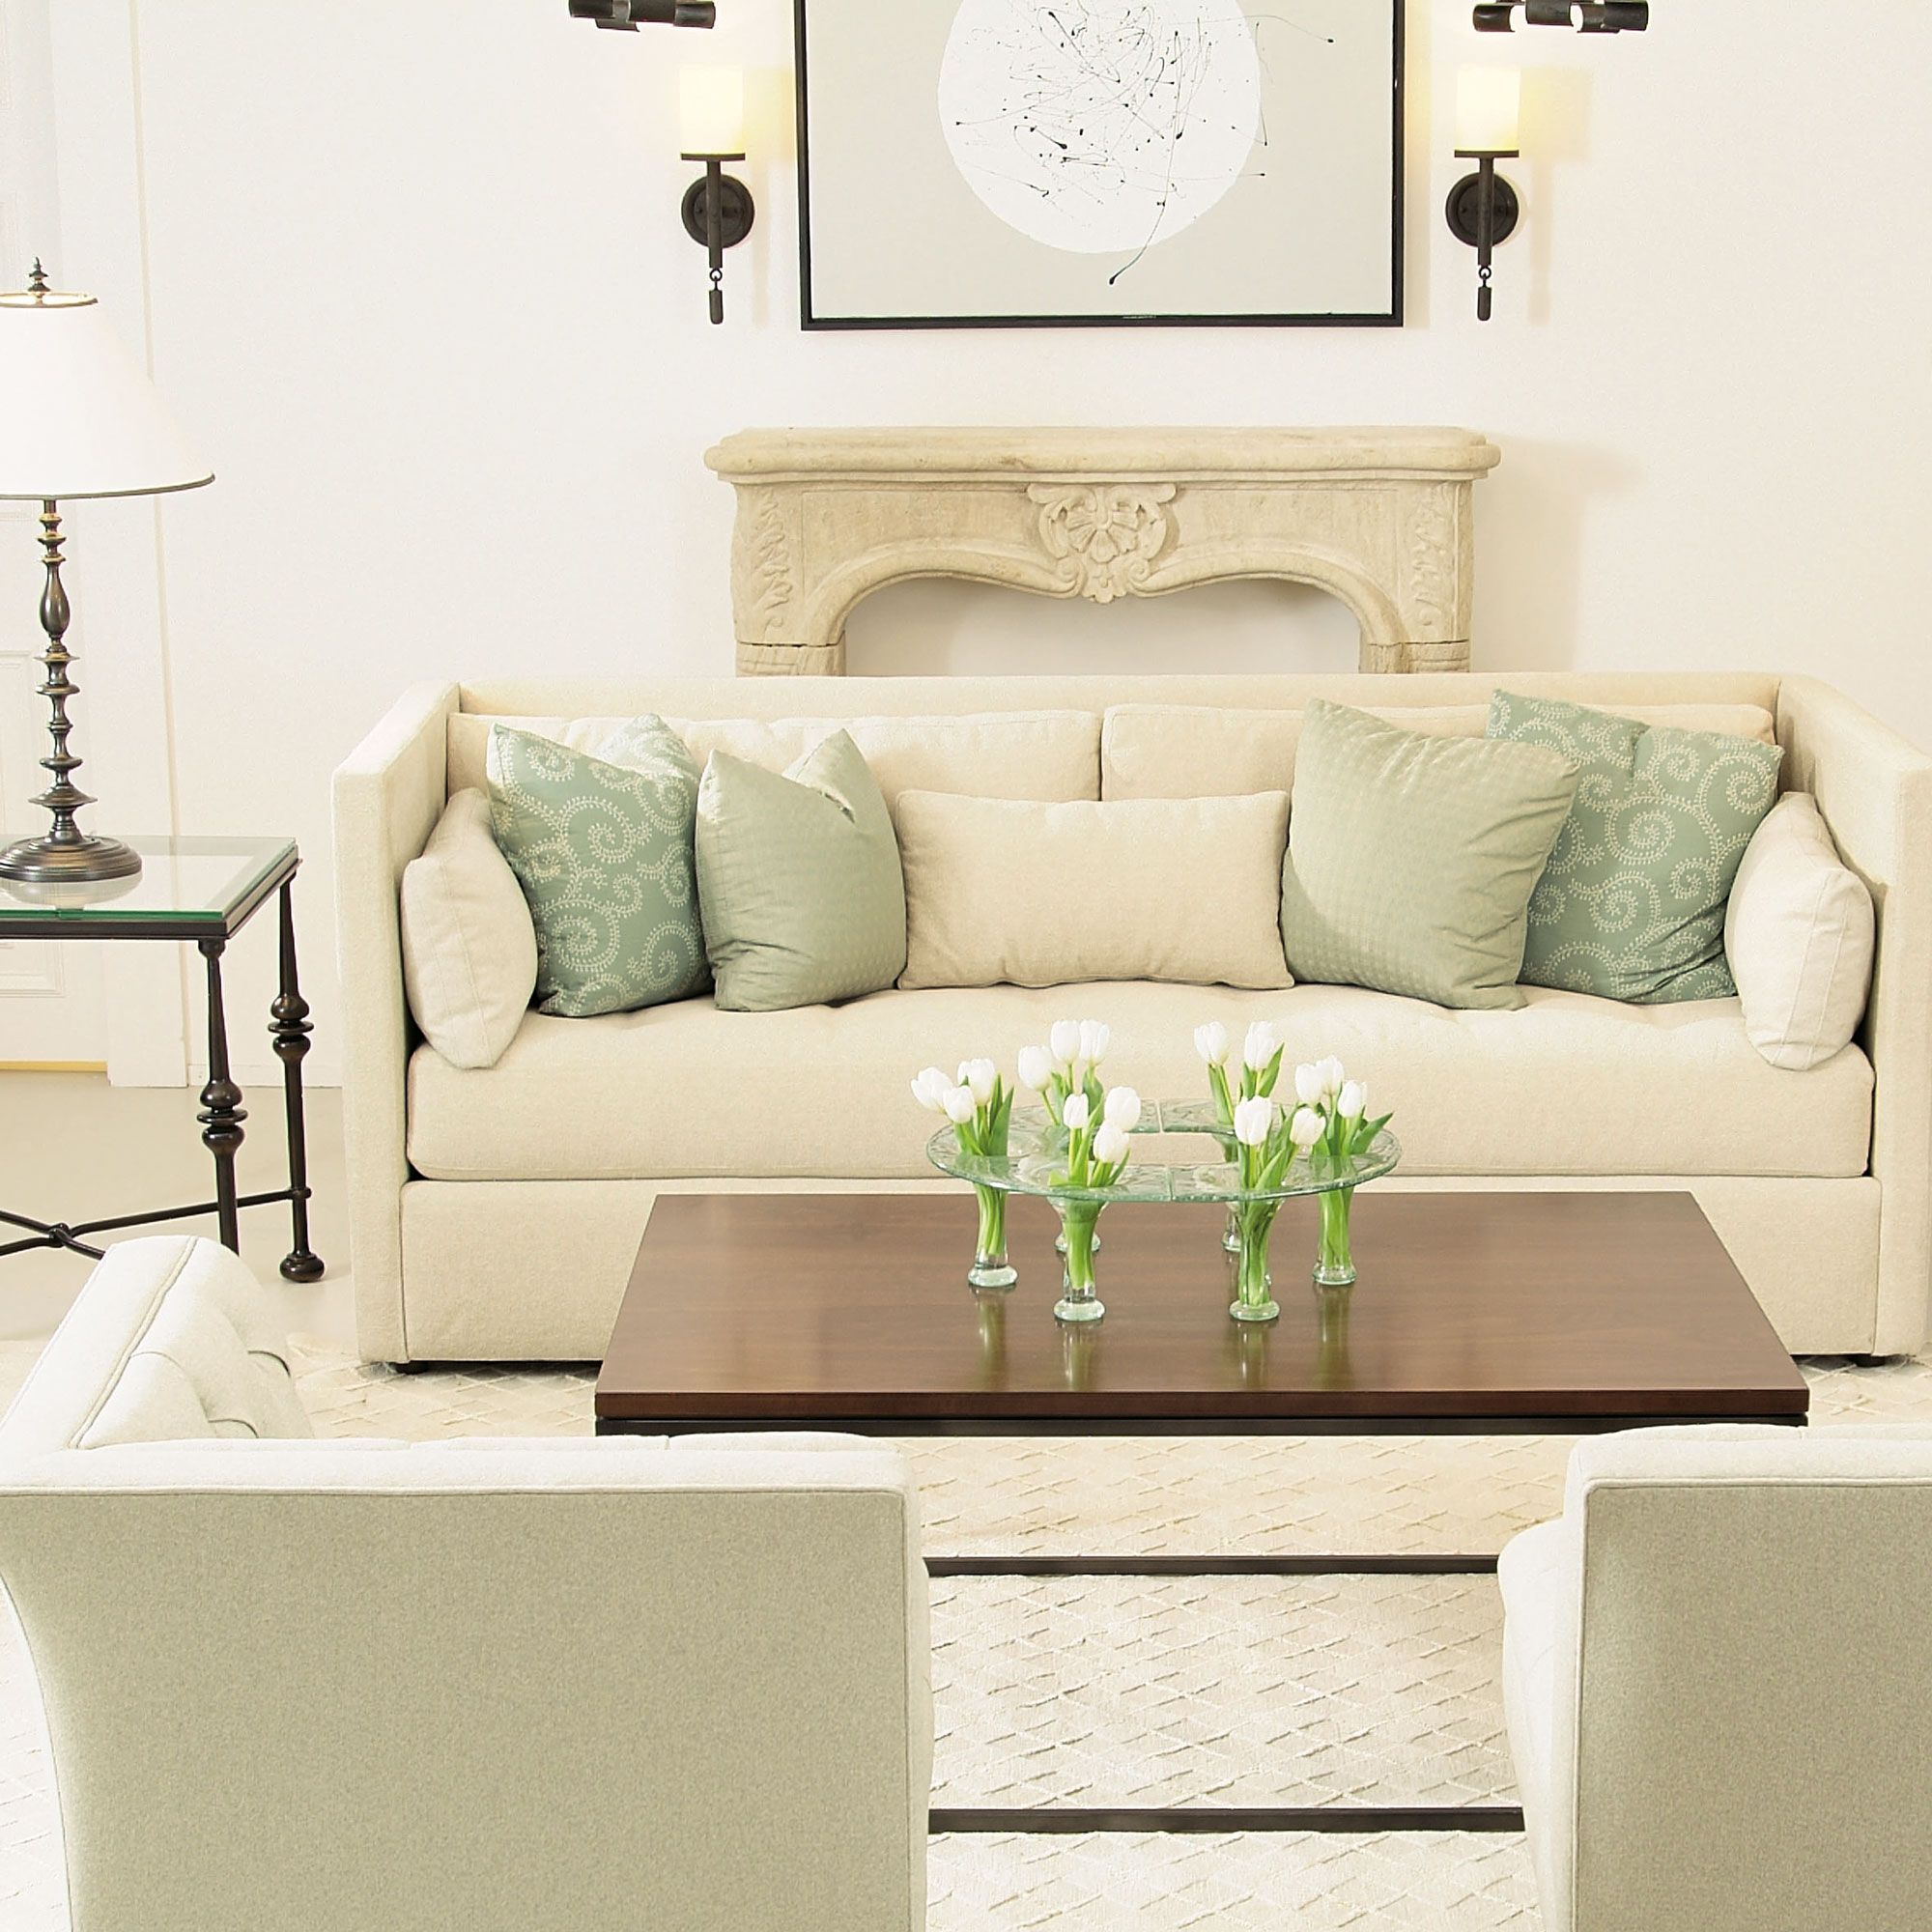 Best Bernhardt Airy Living Room Cream Sofa With Aqua 640 x 480